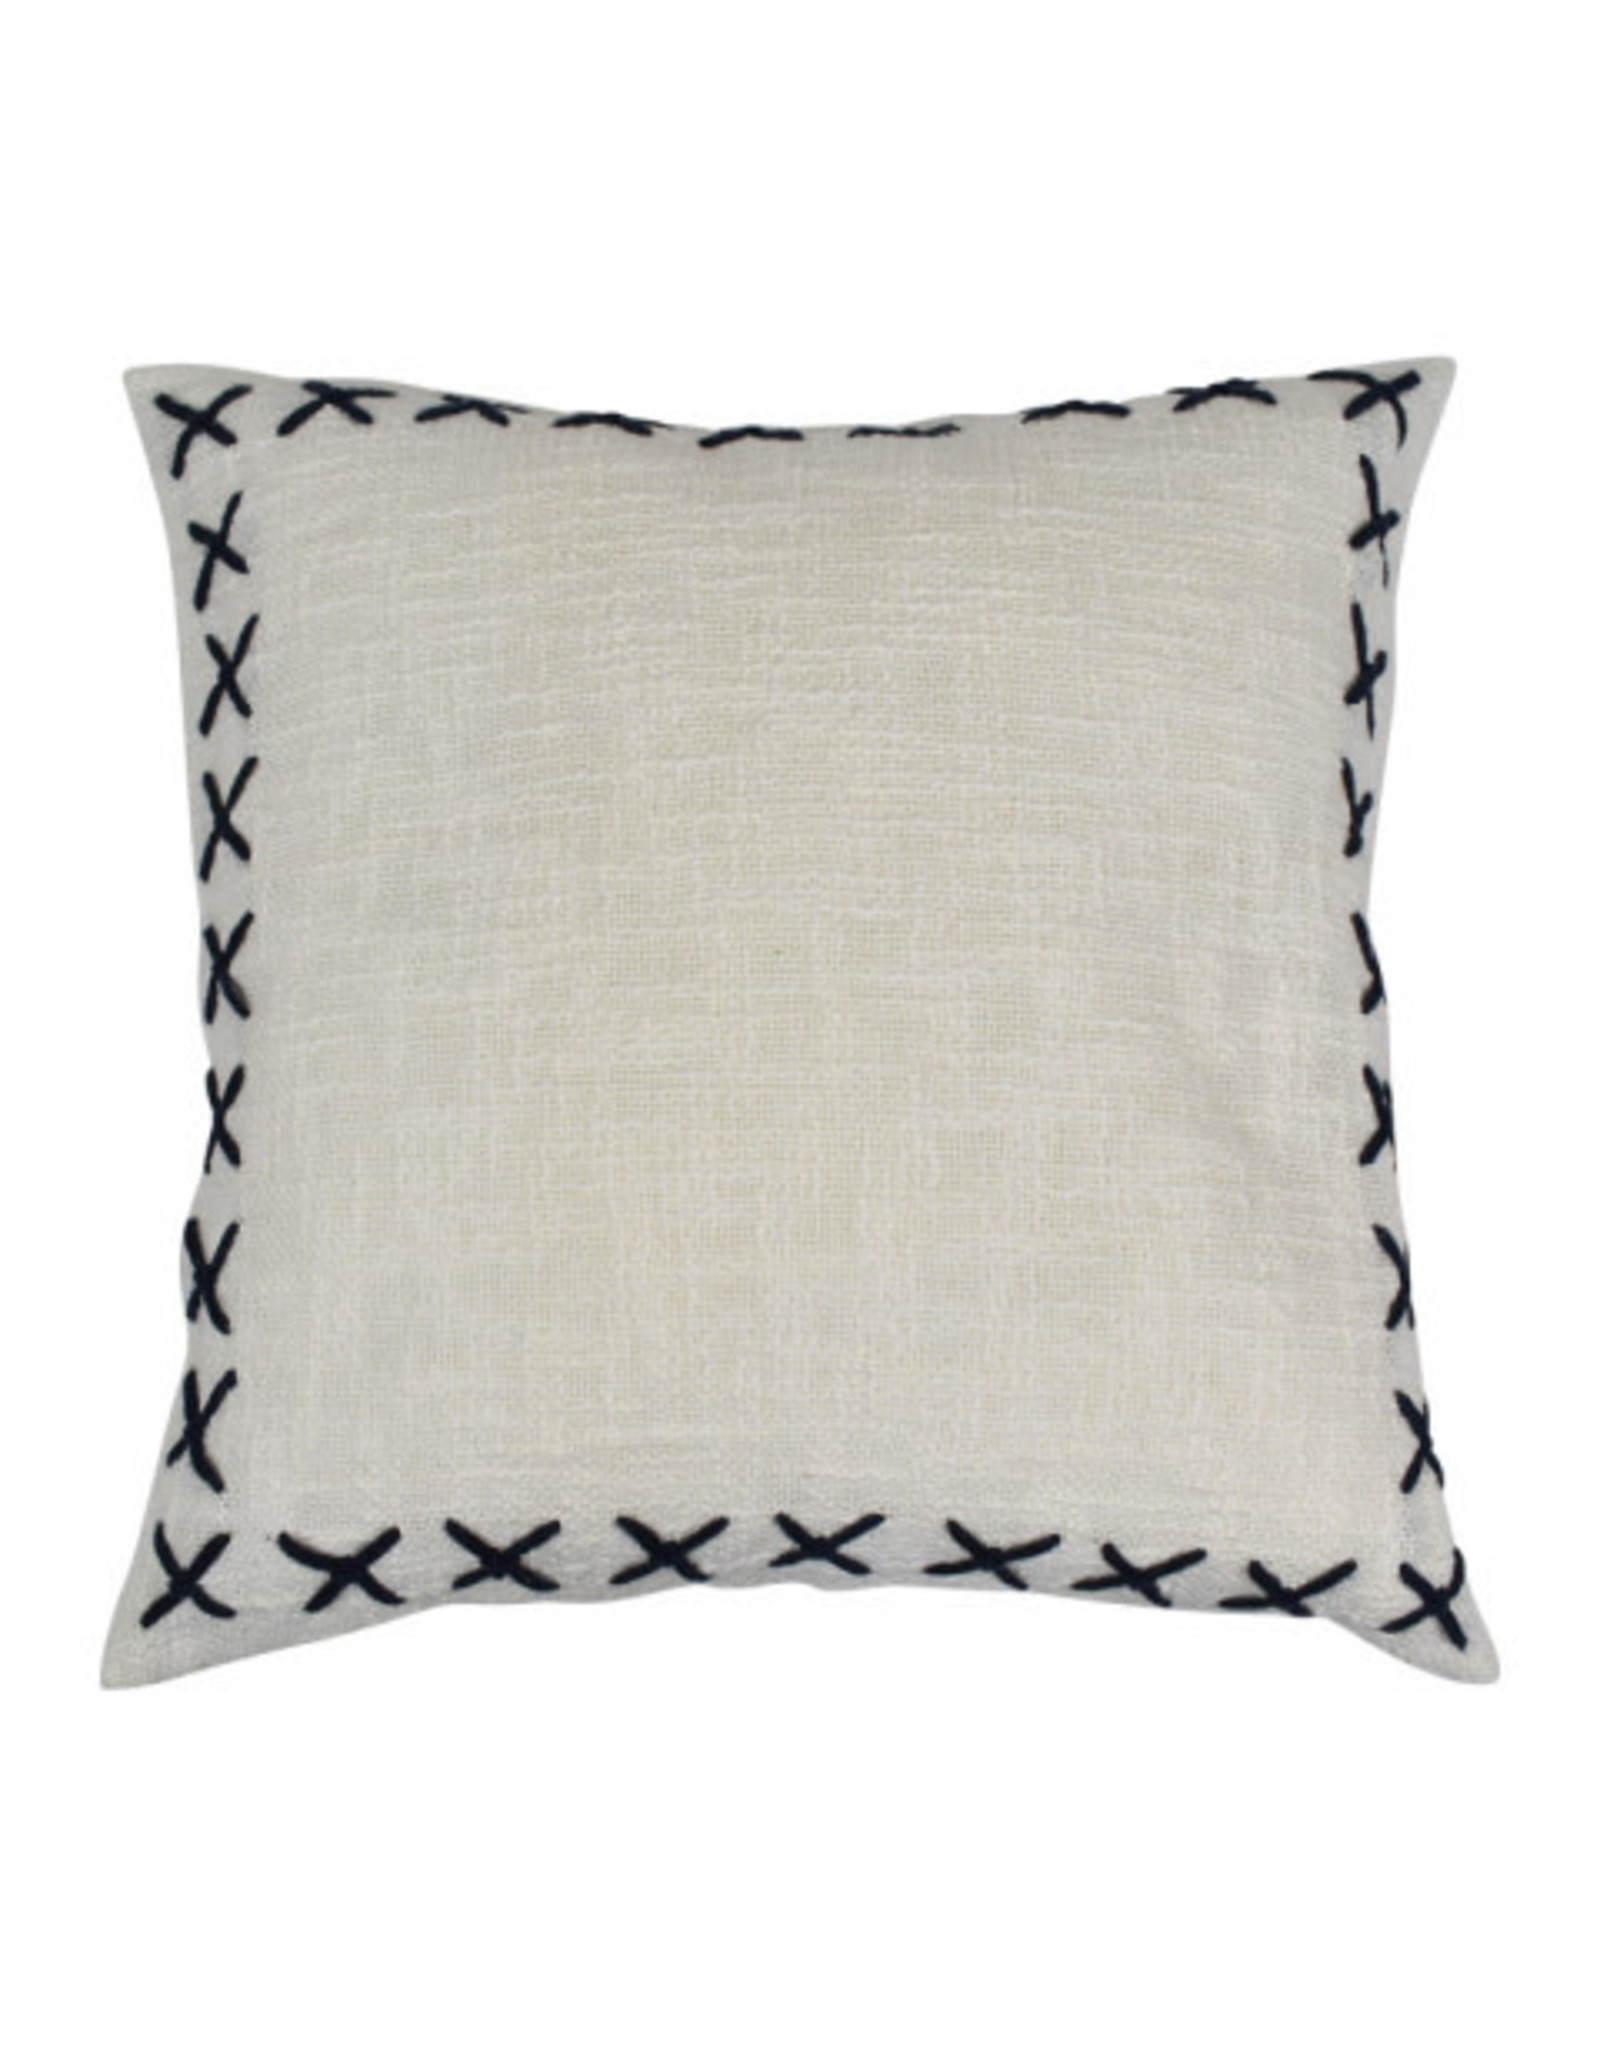 Stitch Cotton Cushion 50 x 50cm White & Navy